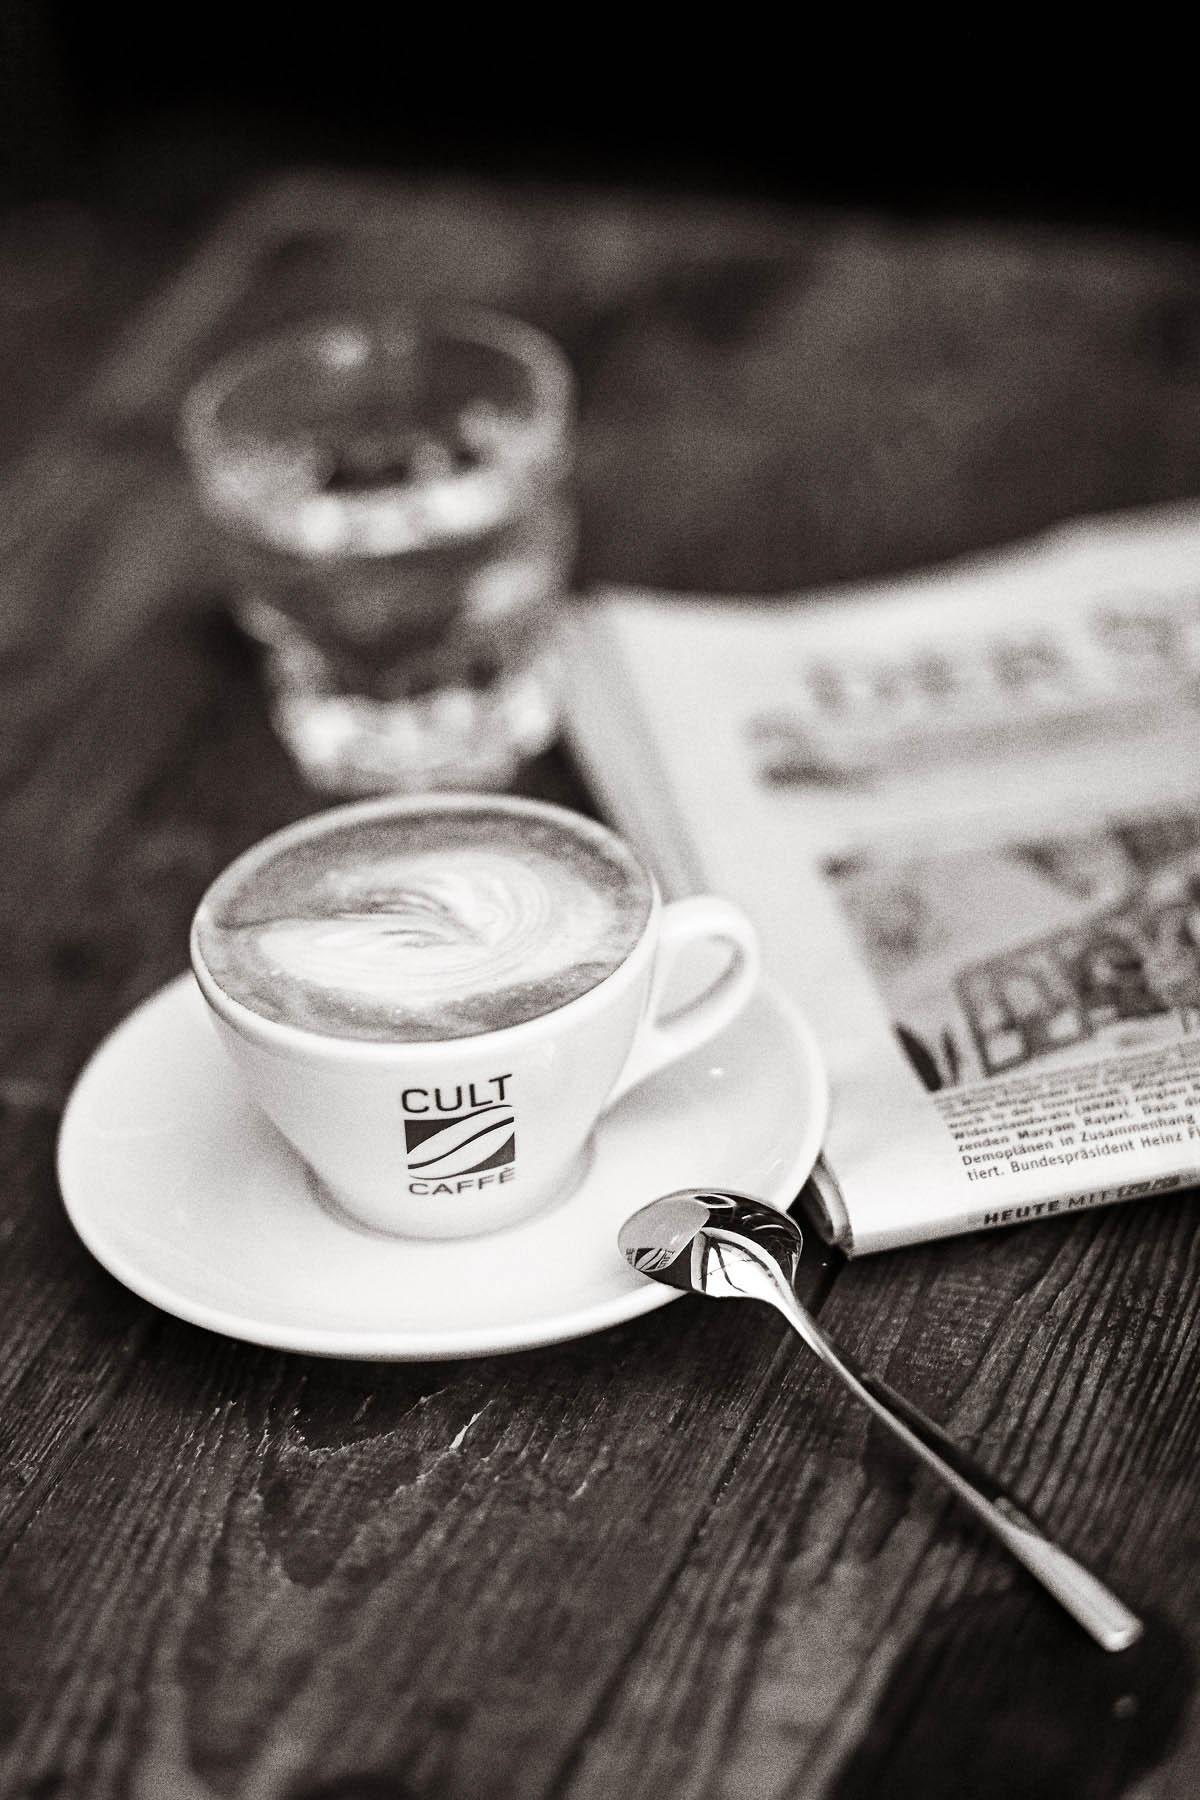 Cult-Caffe-Sappert-Auftragsfoto-at_ _MG_9955